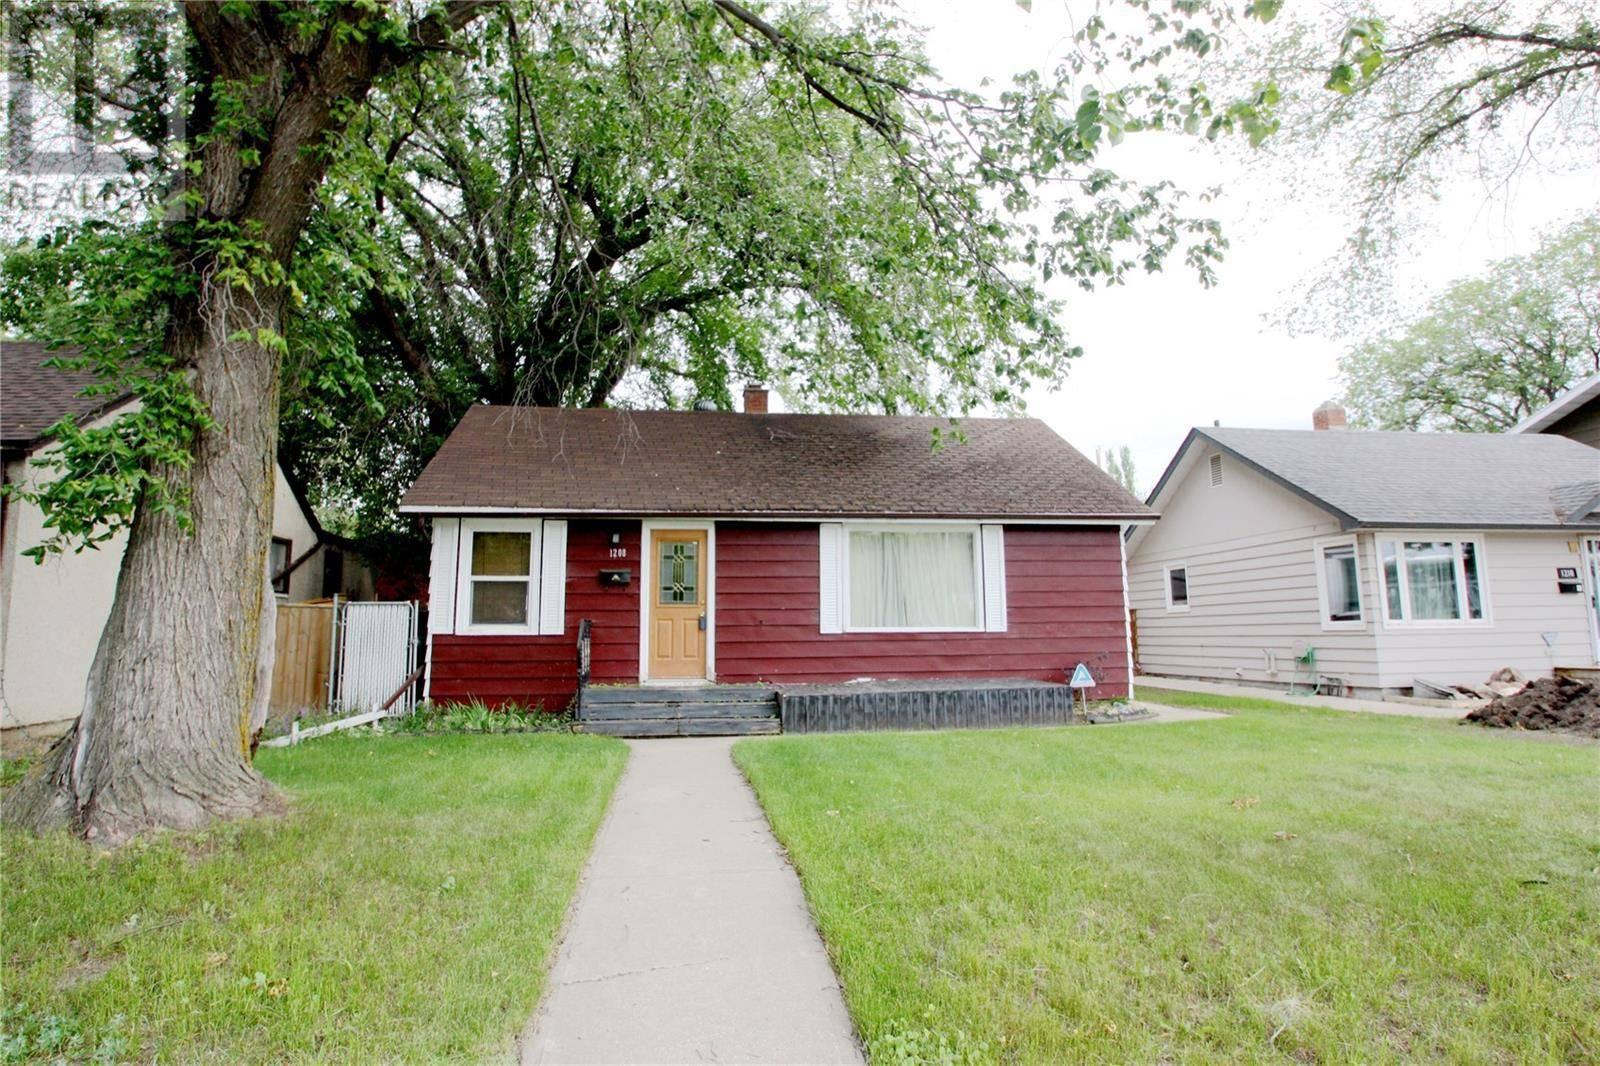 House for sale at 1208 33rd St E Saskatoon Saskatchewan - MLS: SK782762